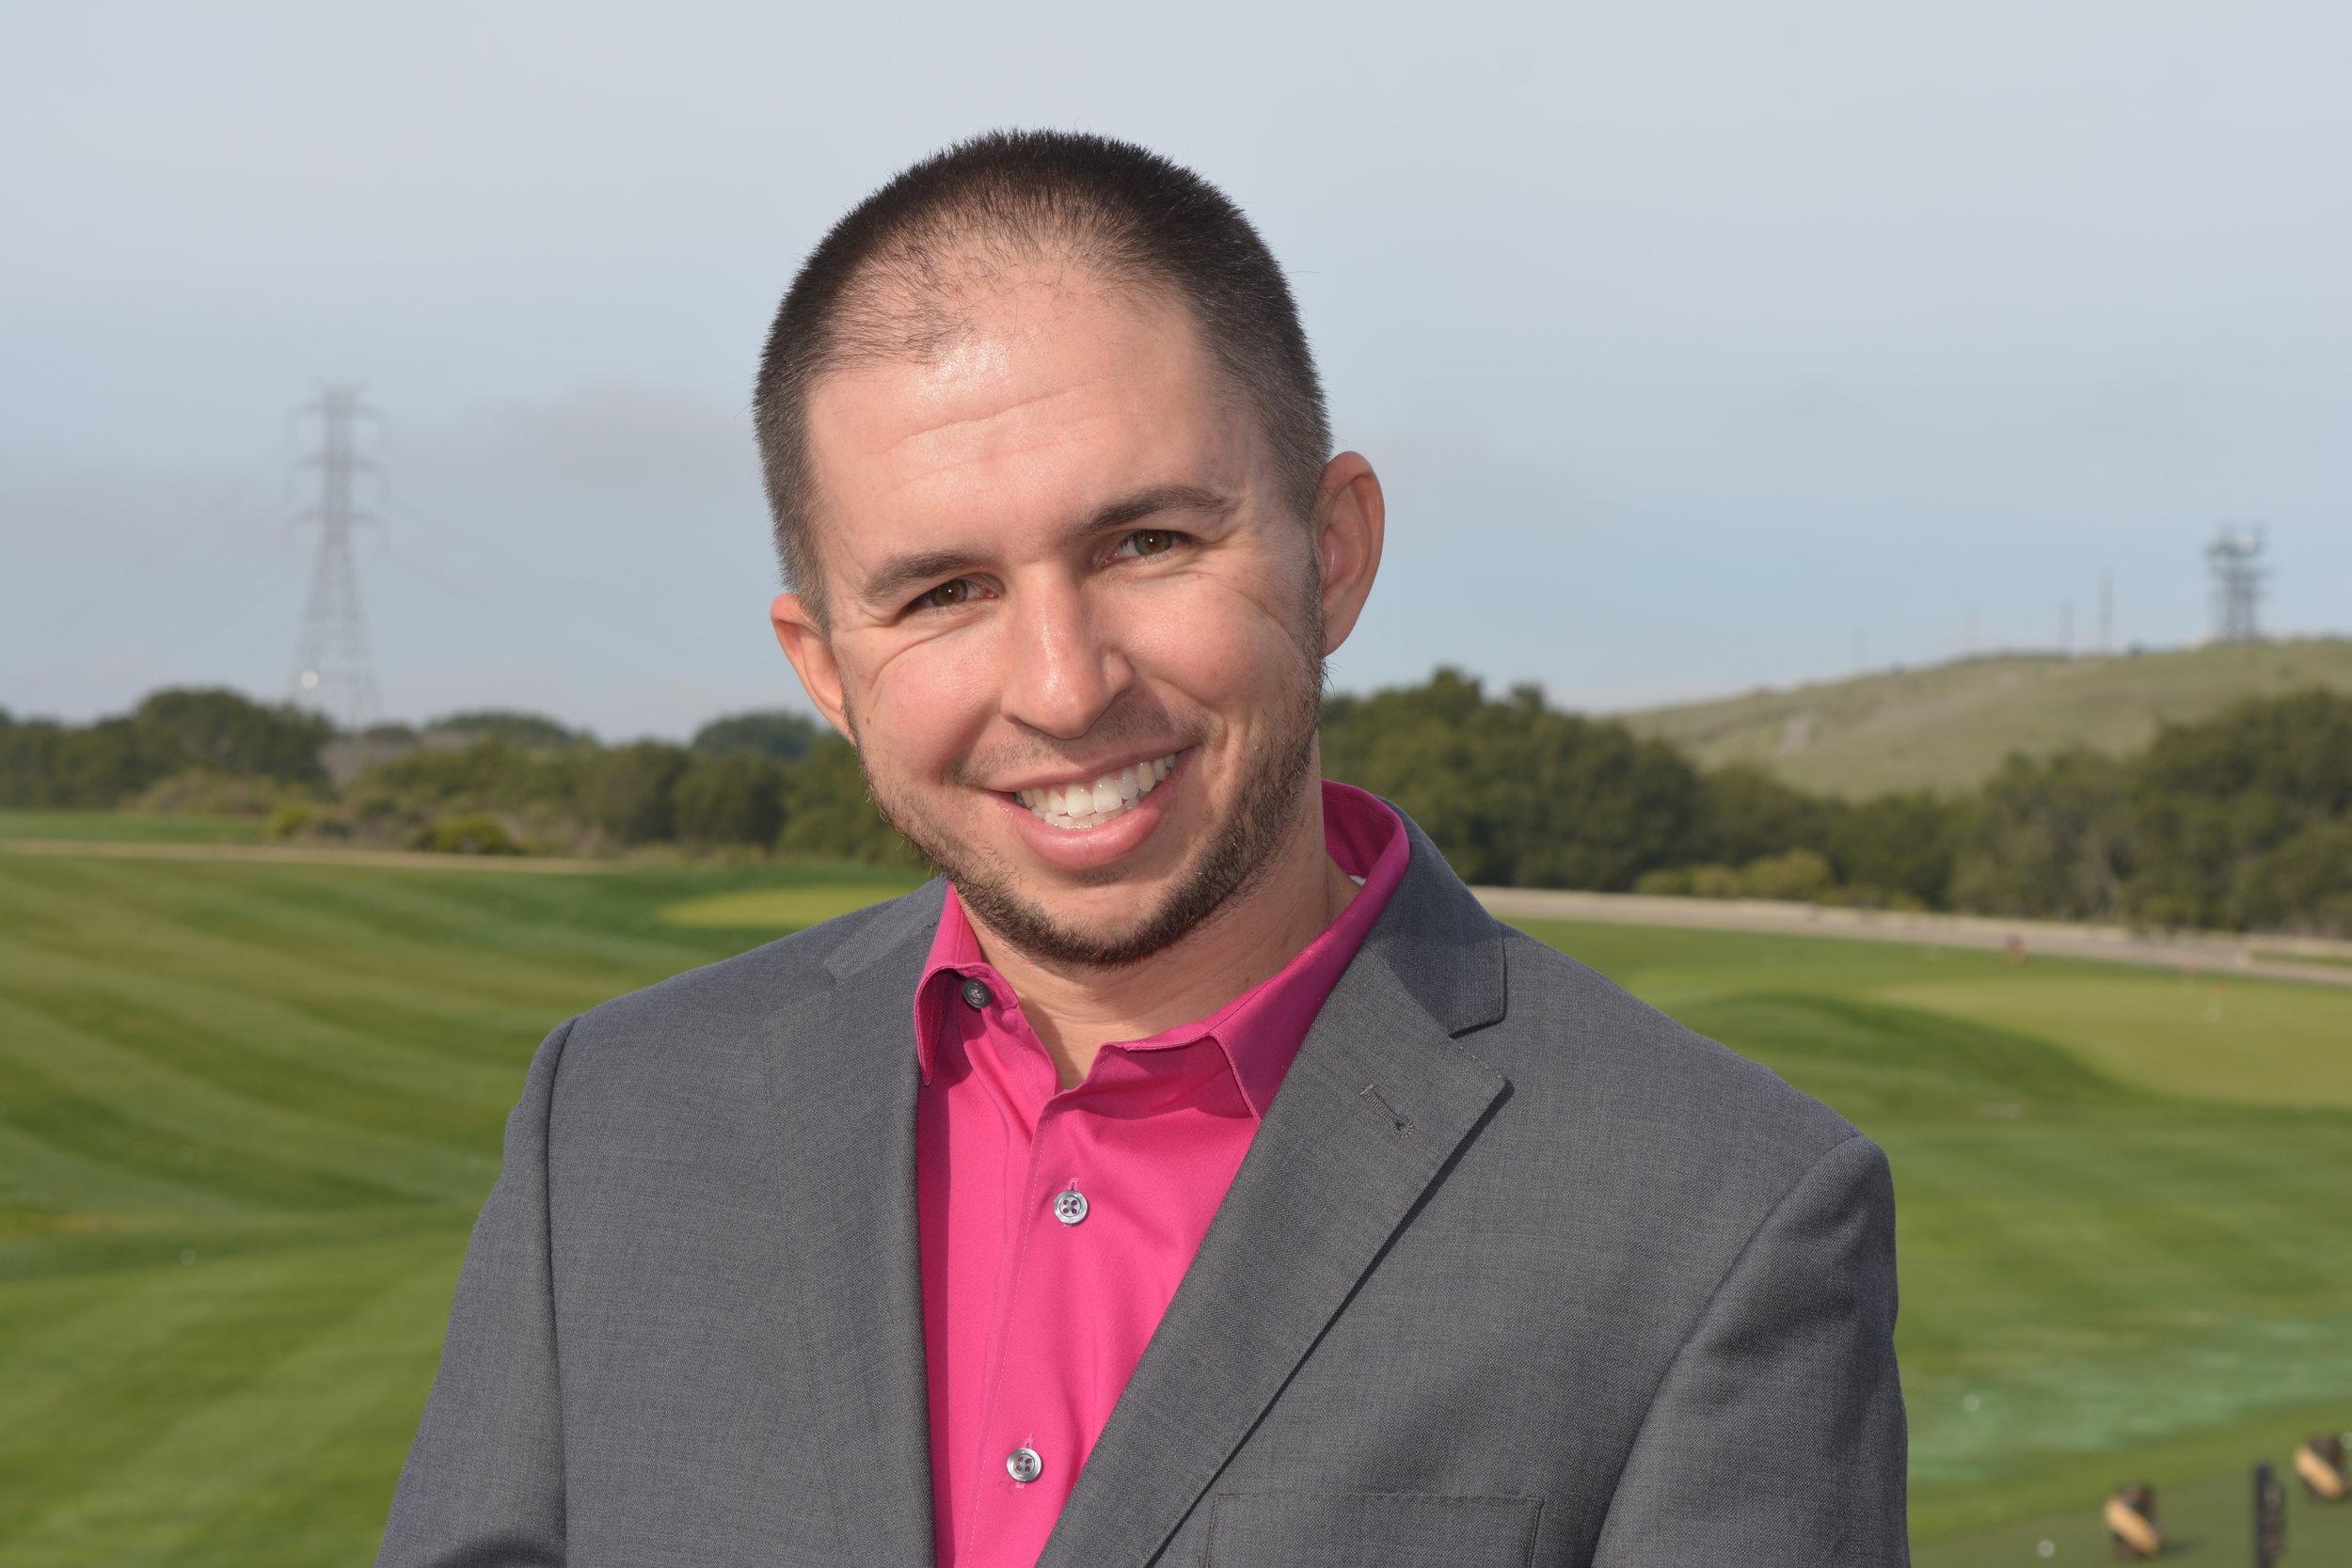 Zach Silva - Membership Experience Manager    Email: zsilva@stonebrae.com    Phone: 510.728.7887